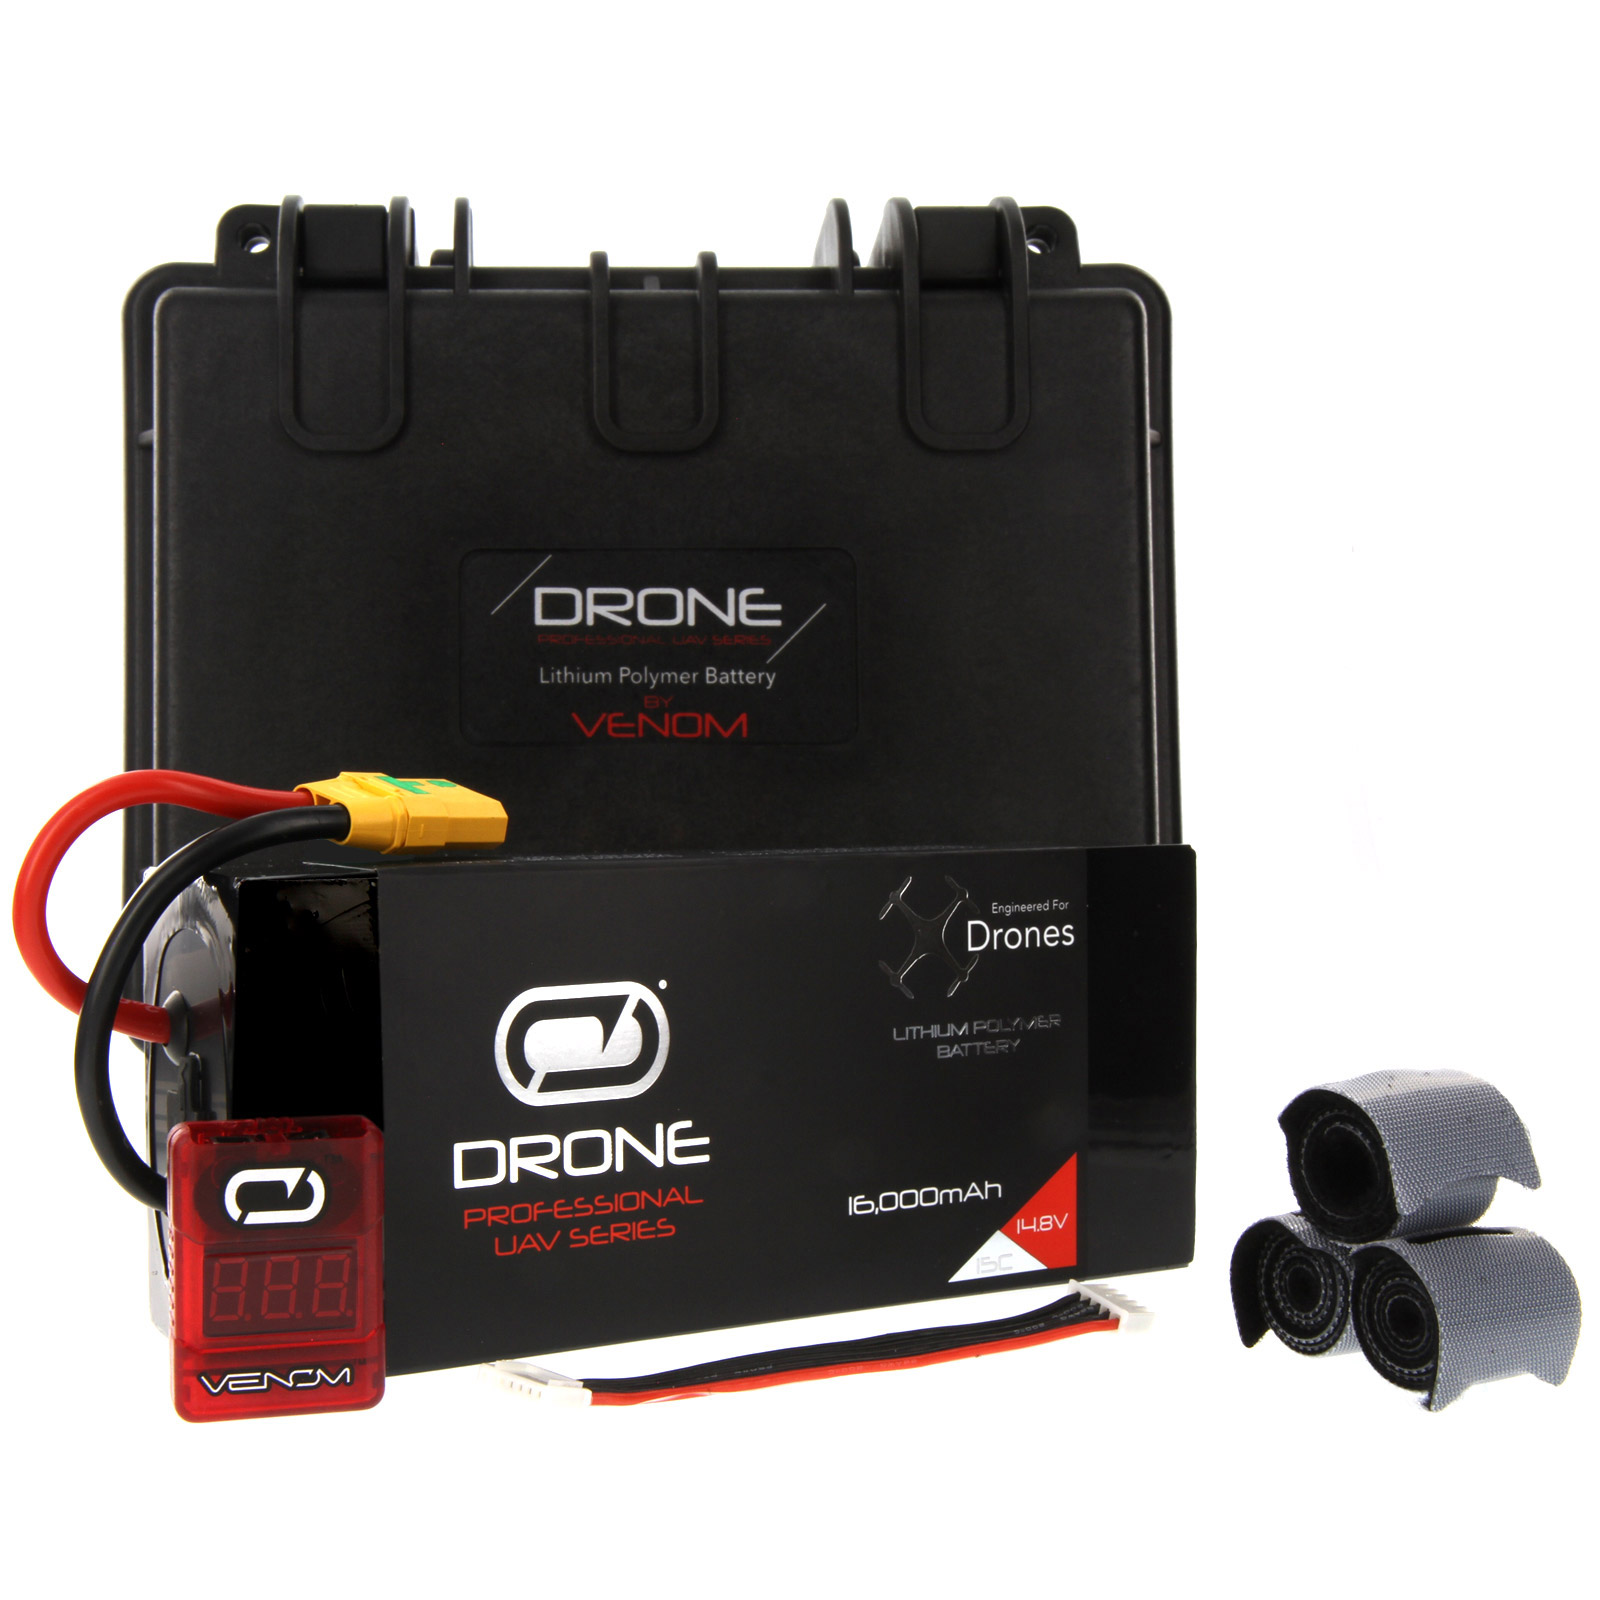 VENOM 16000mAh 4S 14.8V Drone Professional High Capacity ...